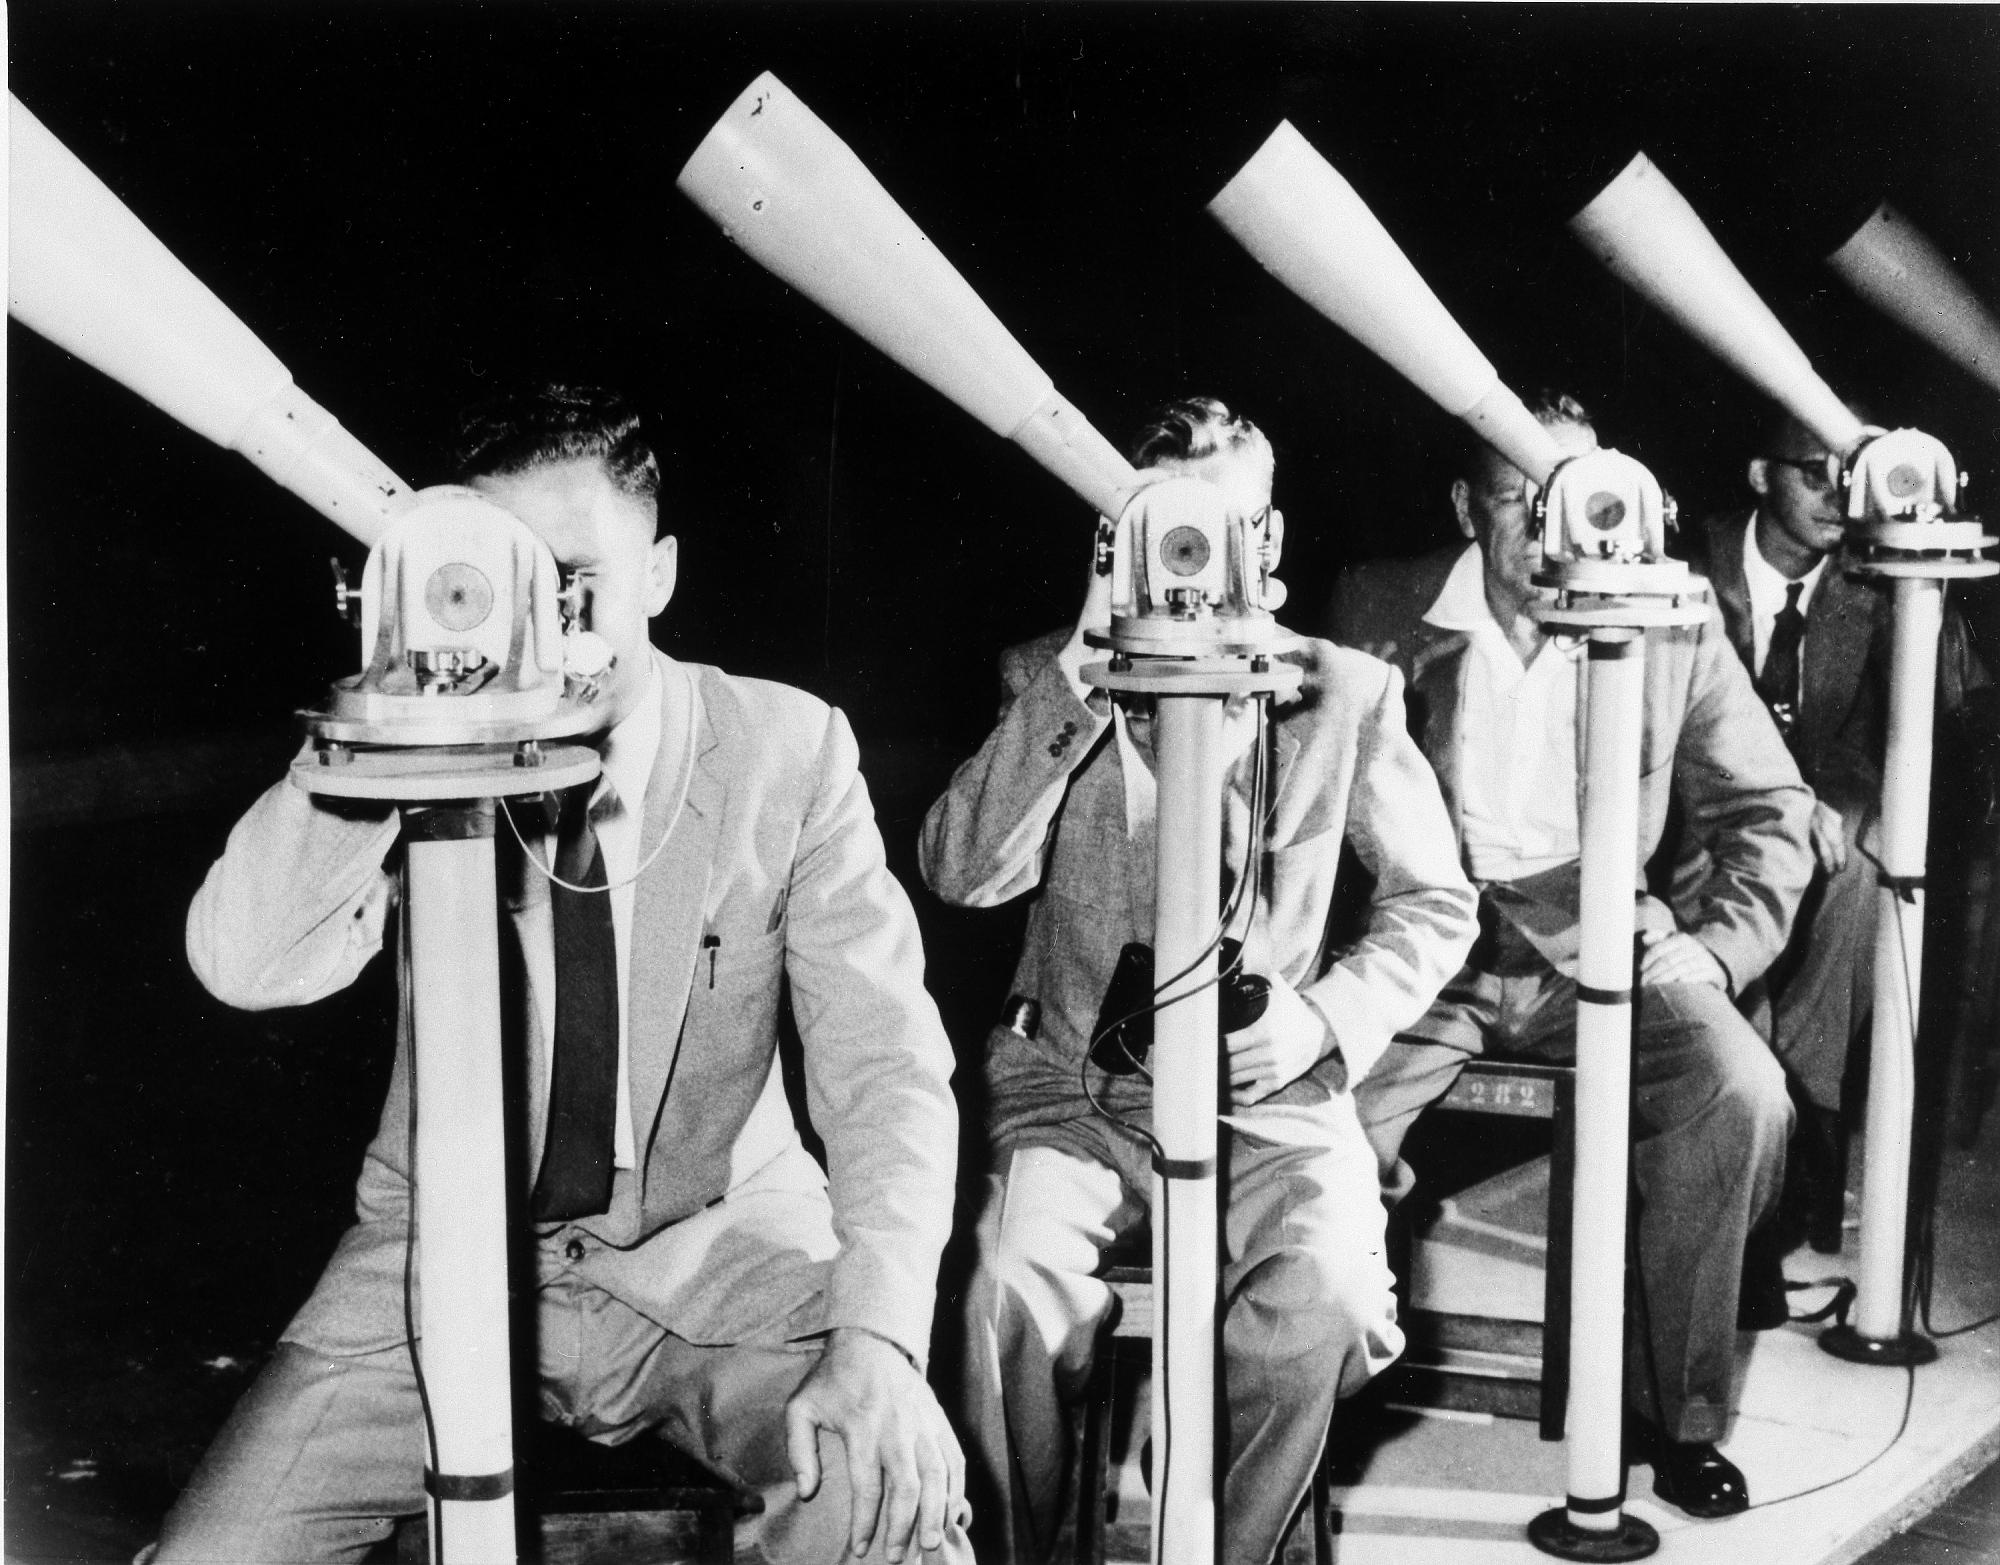 B&W photo of 4 men staggered peering through telescopes